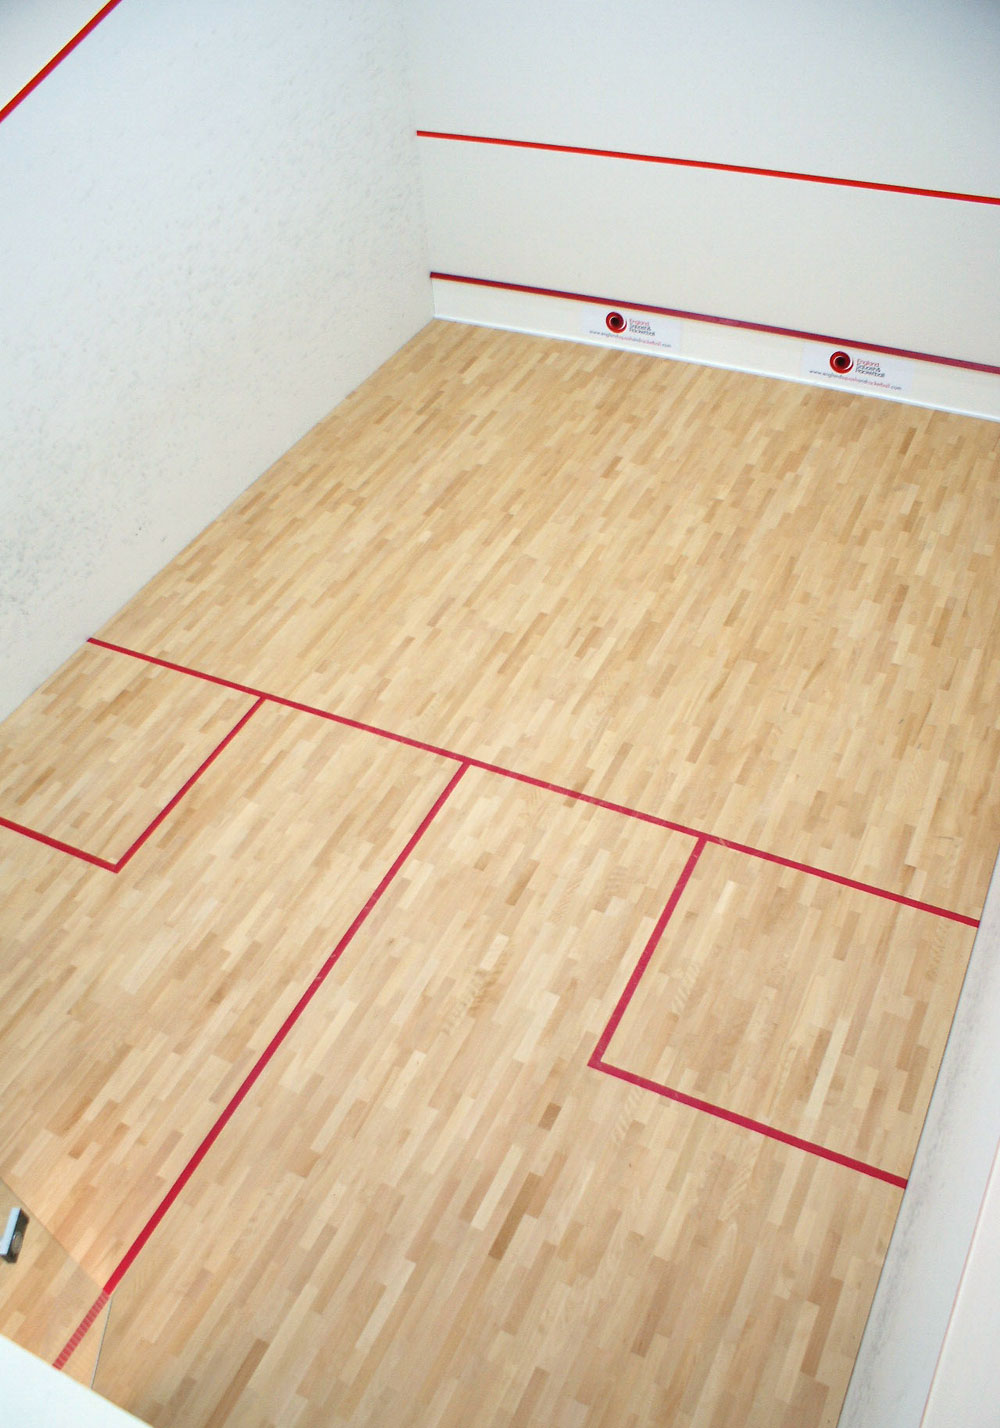 ... floors, squash court cleaning, hardwood floors, sports floors, aerobic